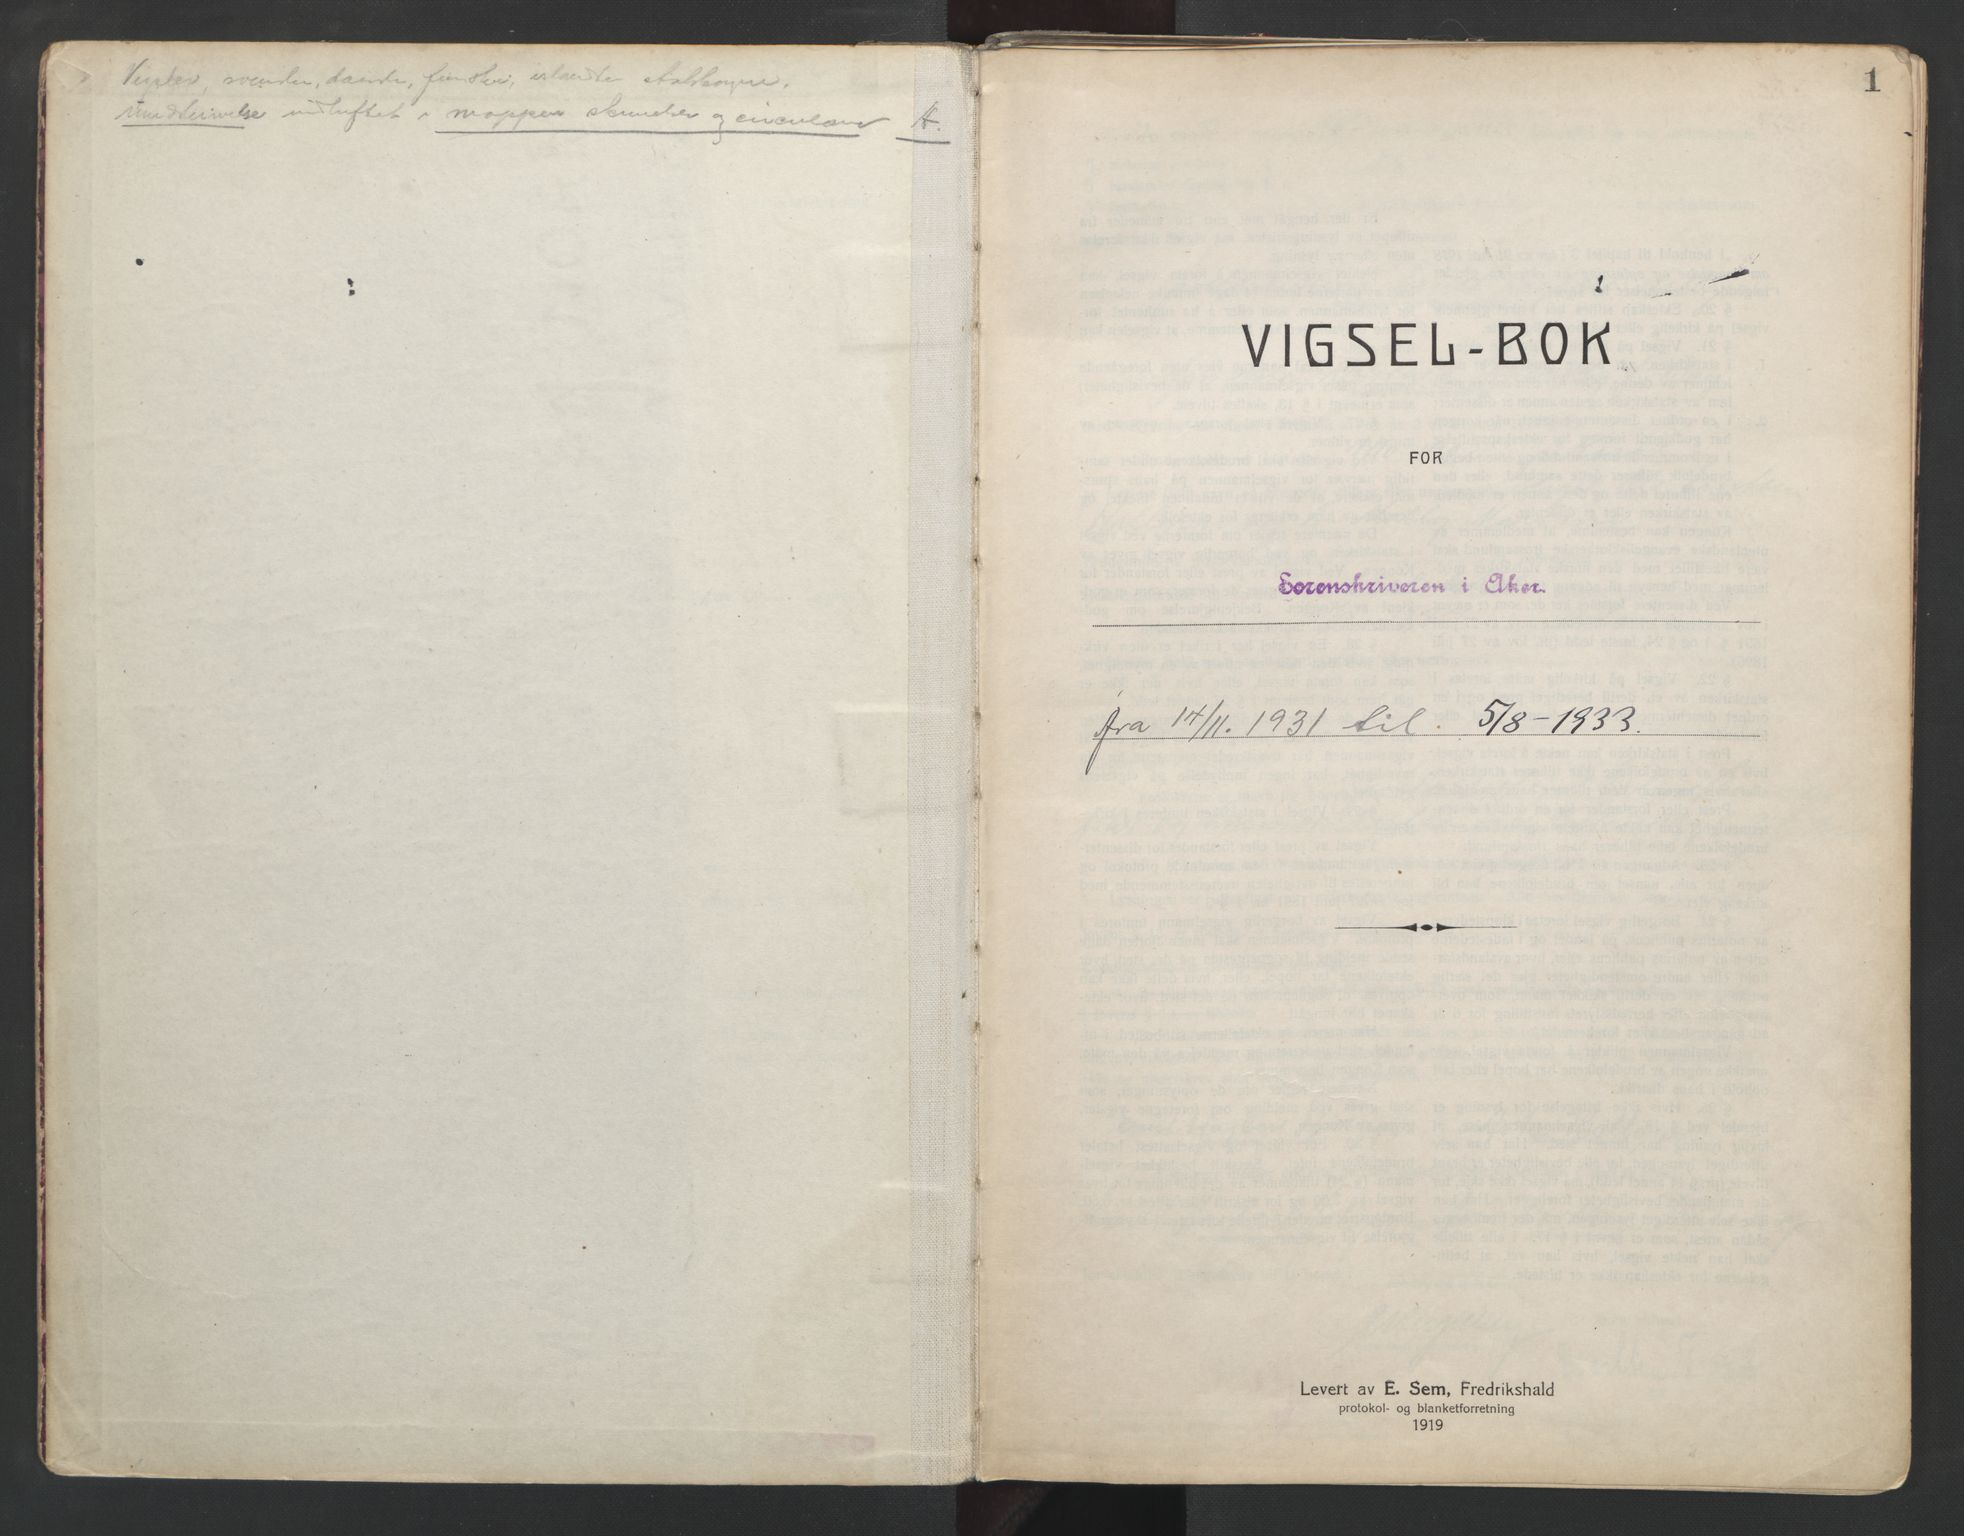 SAO, Aker sorenskriveri, L/Lc/Lcb/L0006: Vigselprotokoll, 1931-1933, s. 1